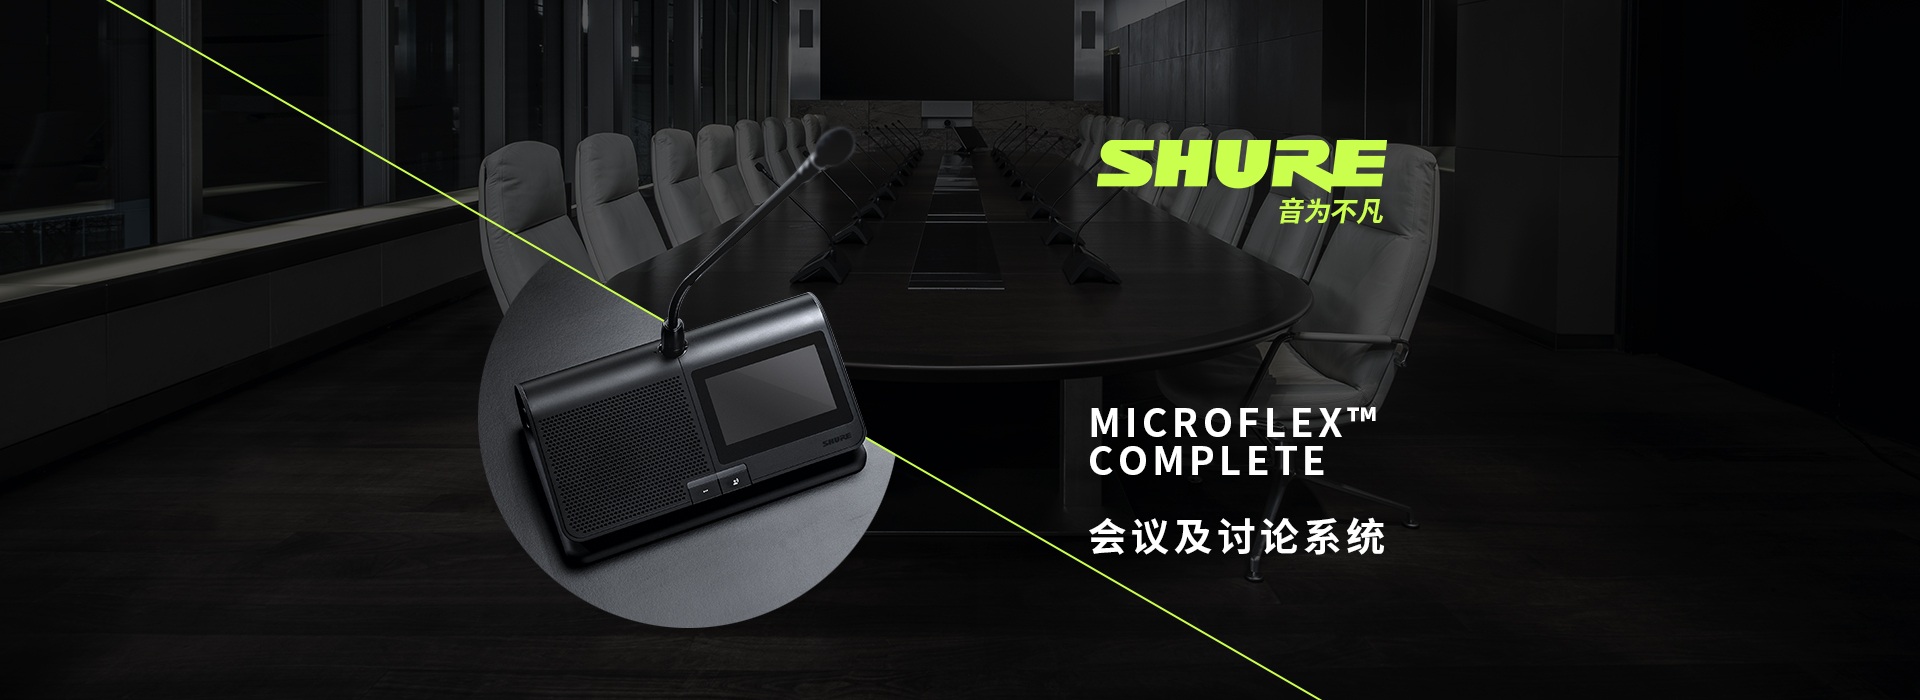 SHURE舒尔Microflex Complete会议及讨论系统